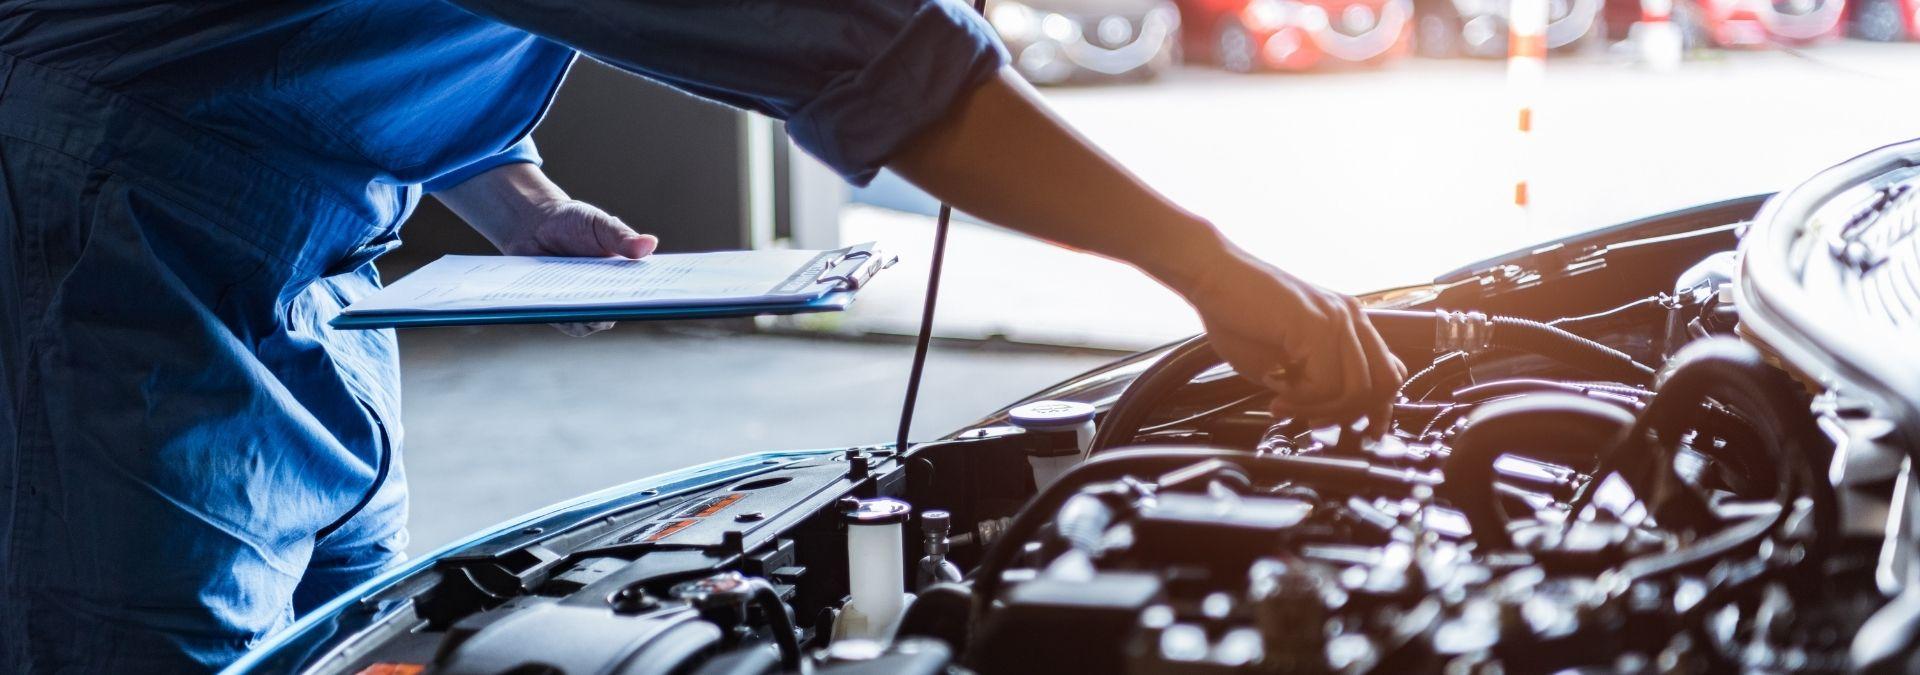 Automotive Maintenance Technician